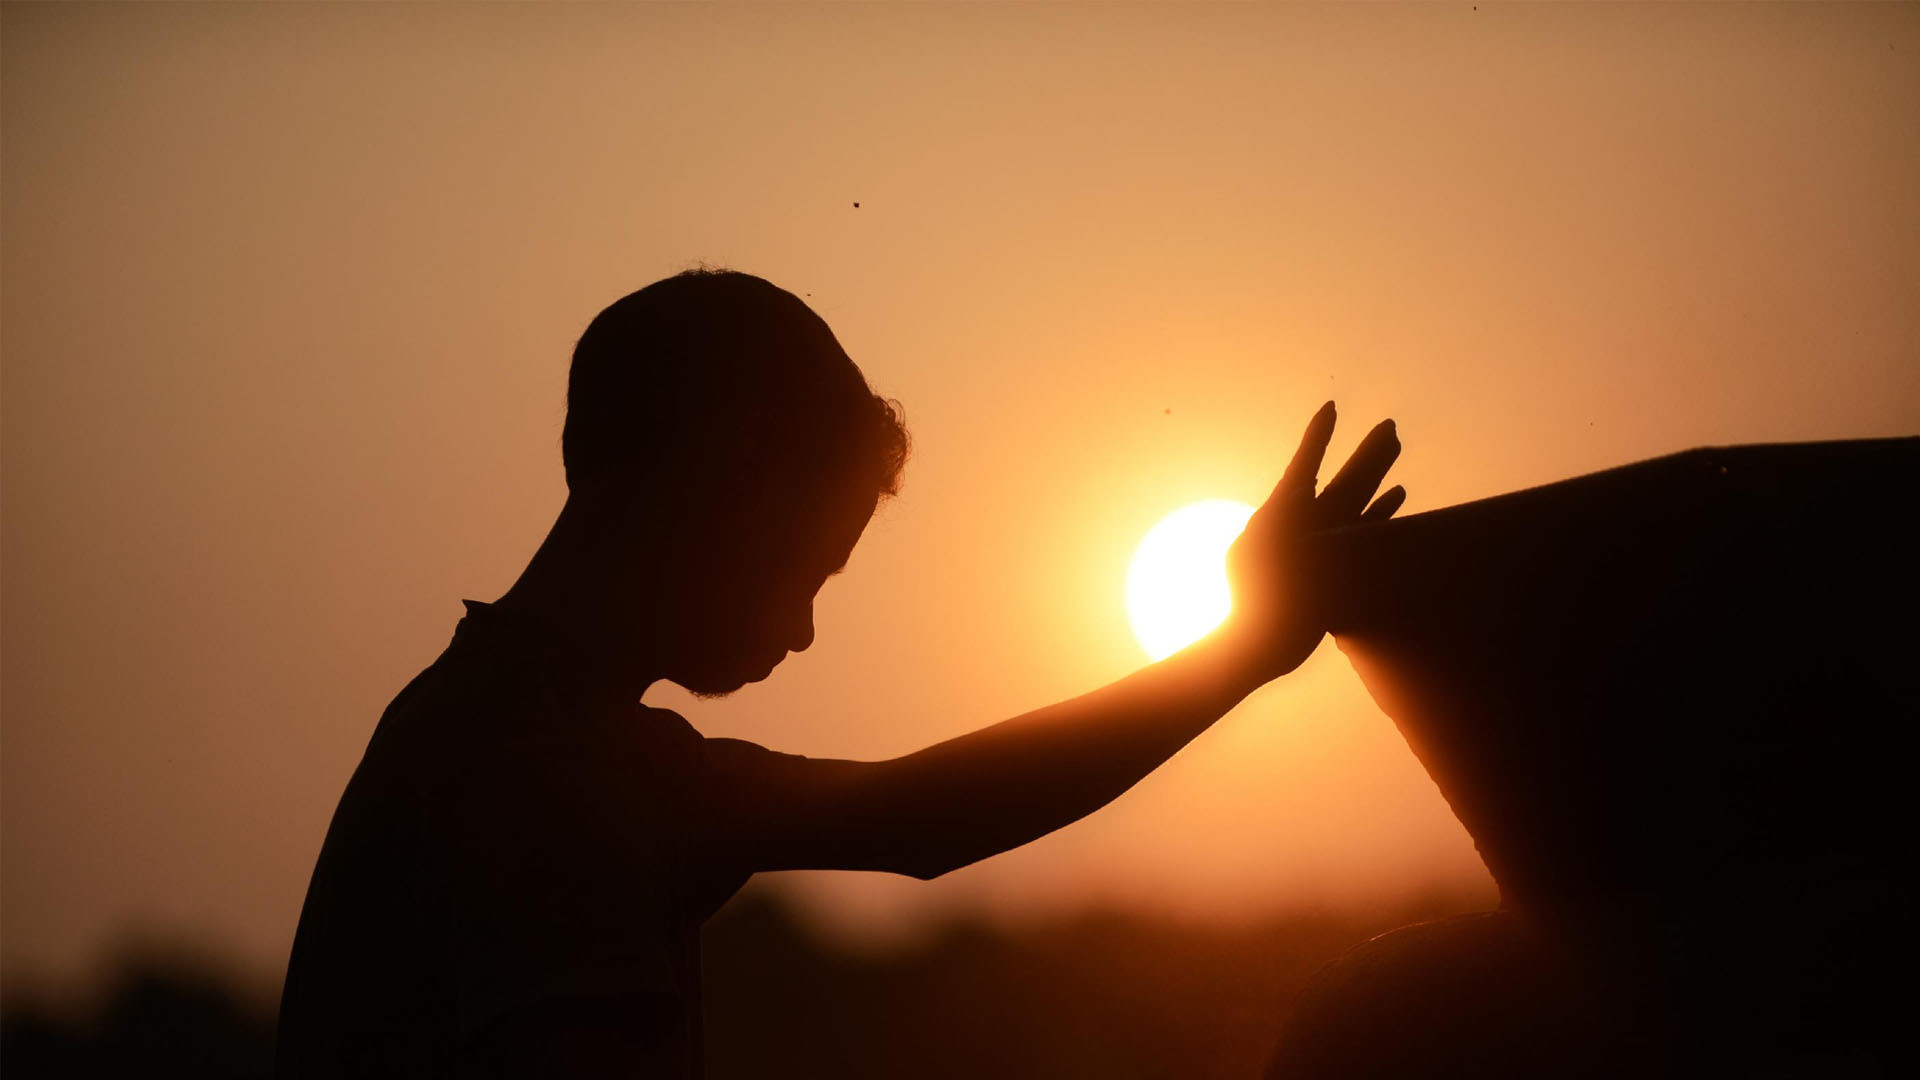 Wallpaper: Kids Prayer Sunset HD Wallpaper. Upload at October 16, 2014 .